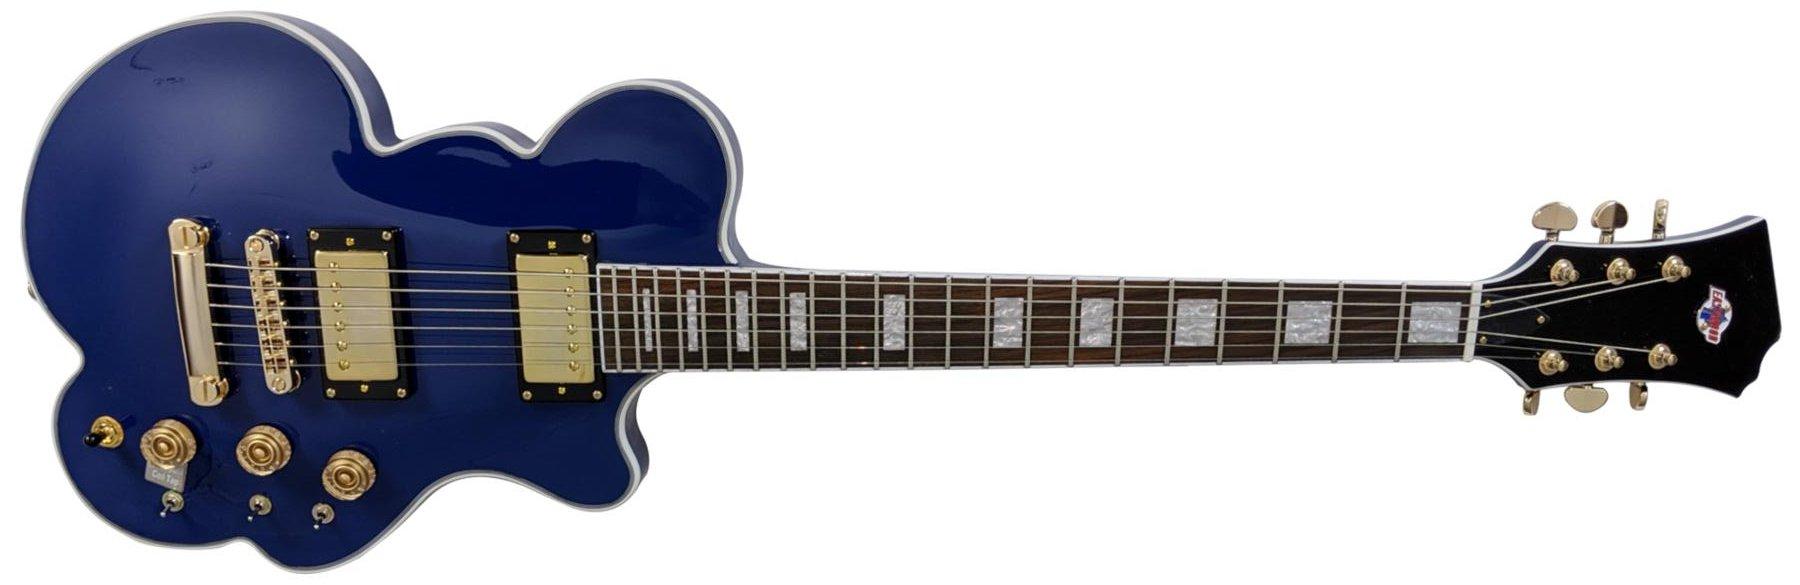 Devo Cloud Guitar